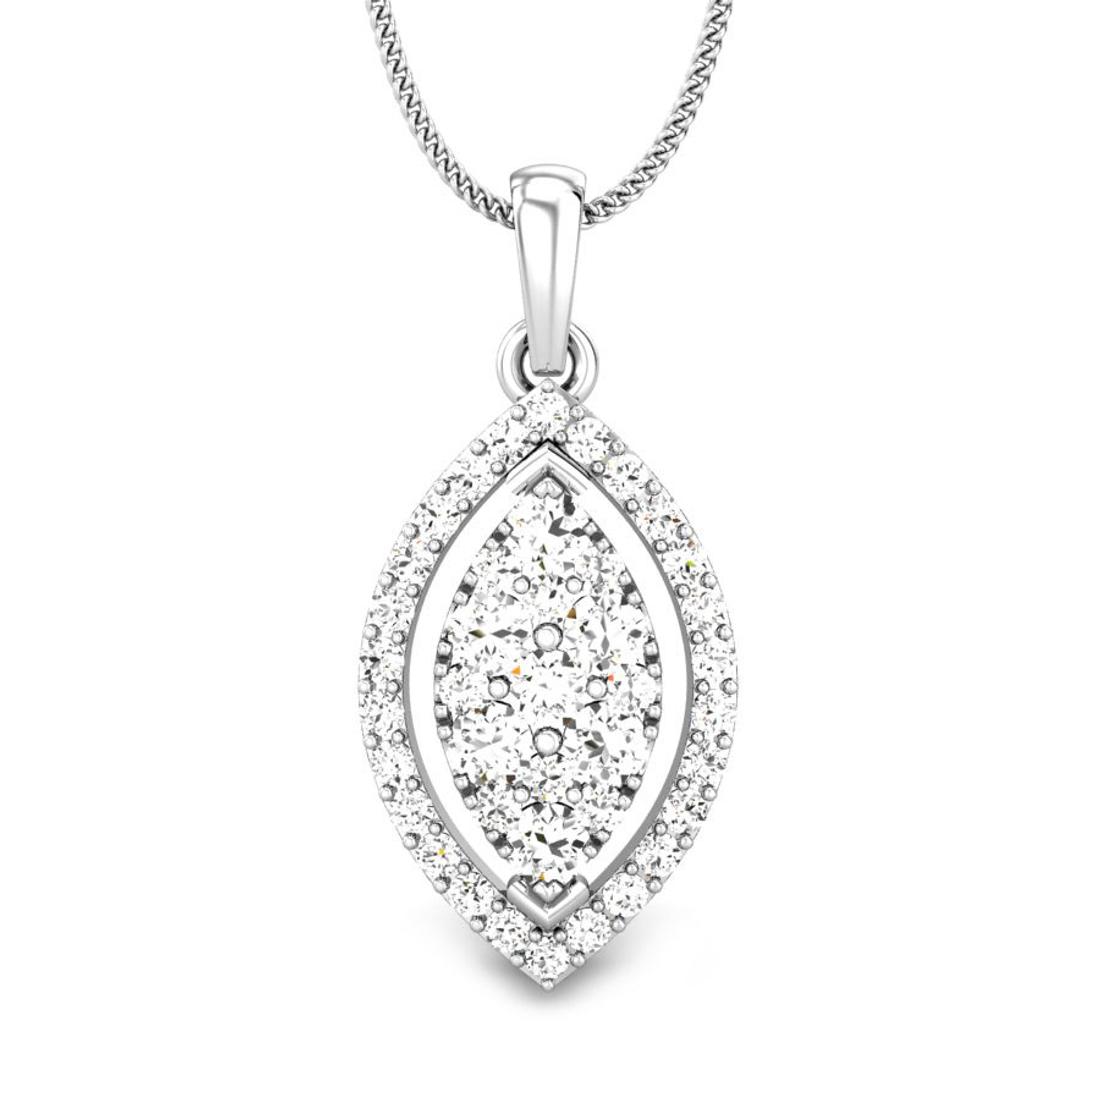 Candere by Kalyan Jewellers White Gold Kirie Ziah Diamond Pendant for Women (IGI Certified)